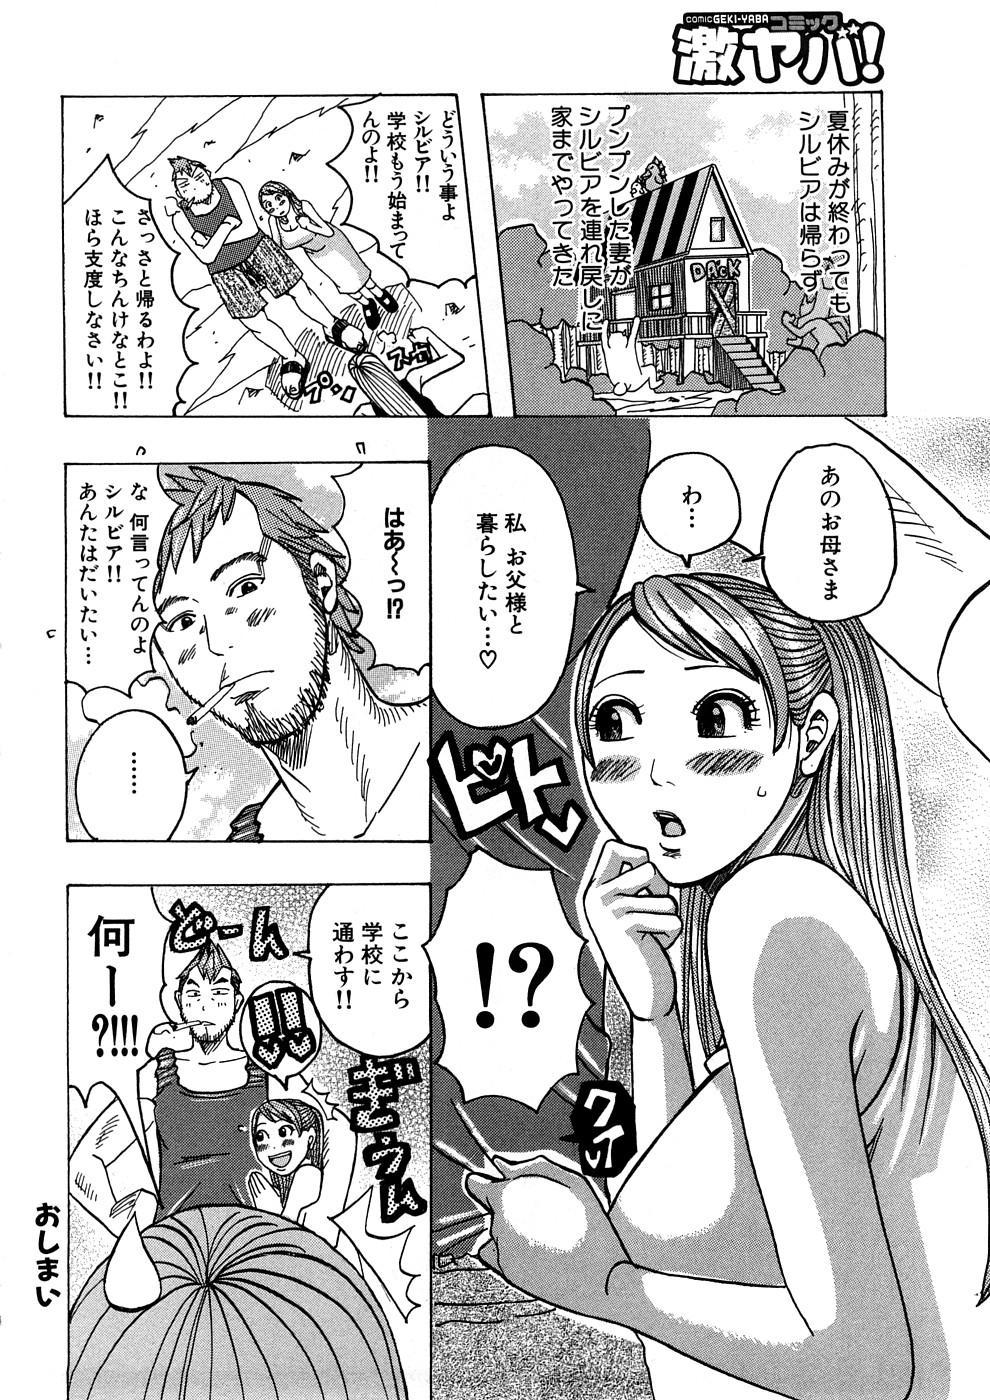 Geki Yaba Anthology Vol. 1 - Naka ni Dashite yo 102